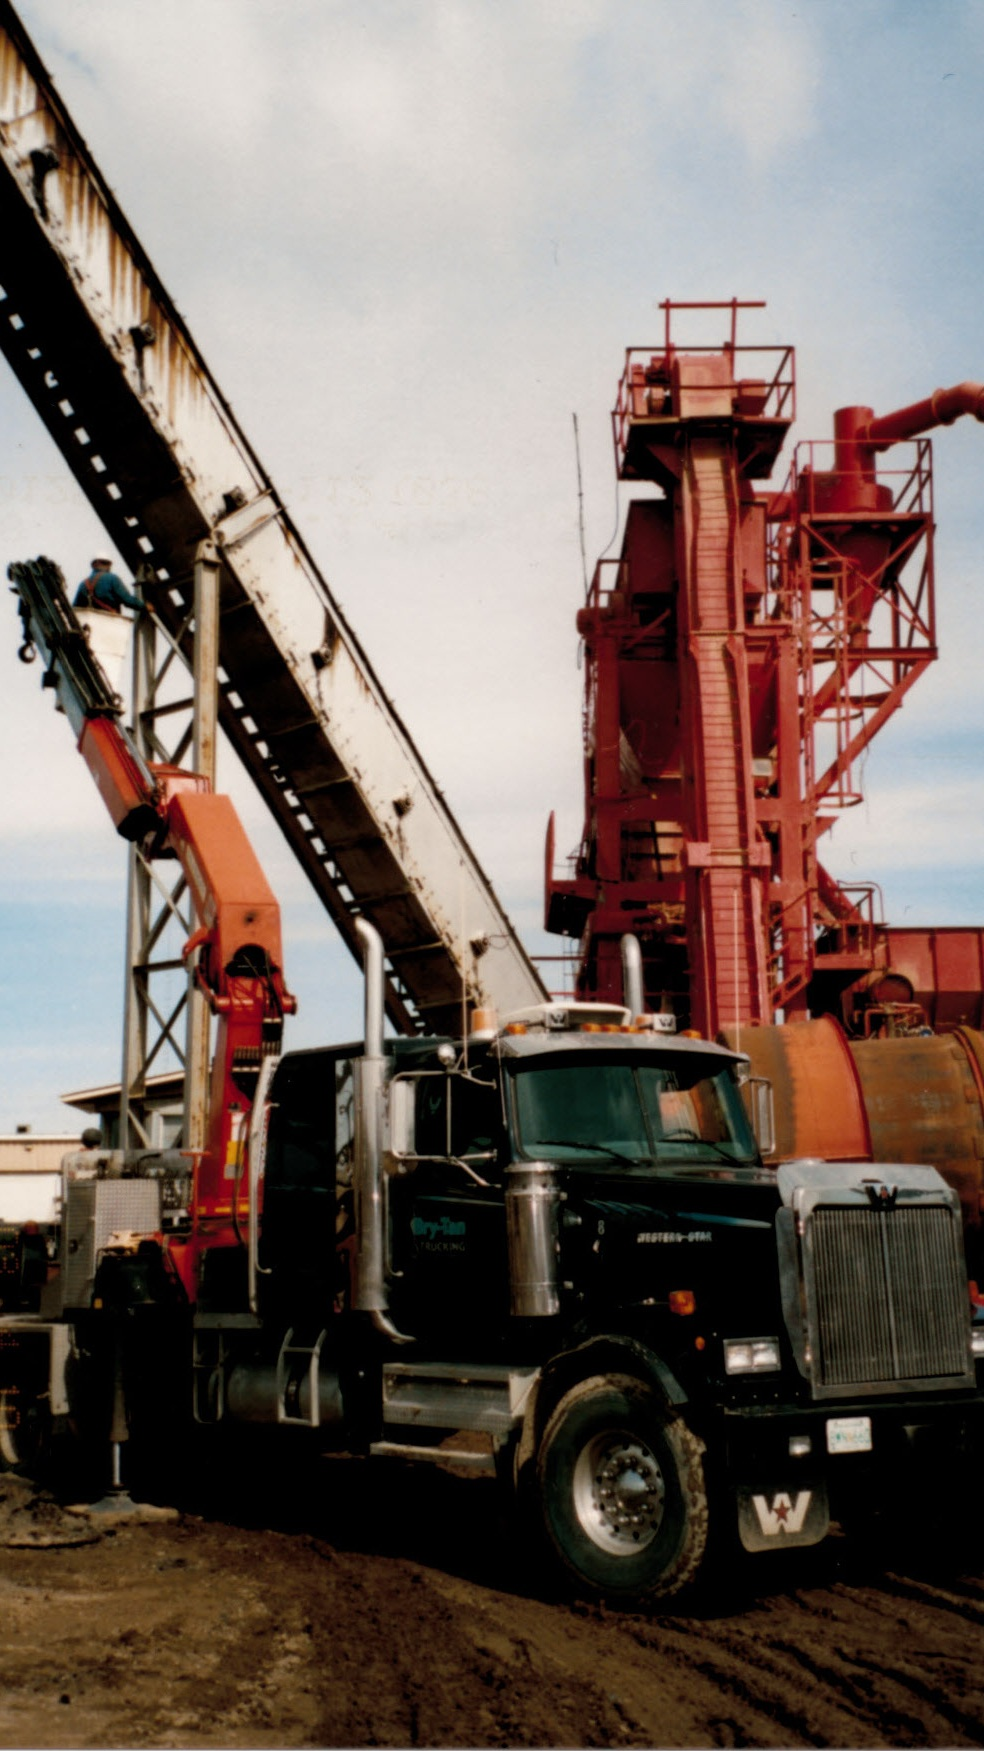 2004 - 26 ton knuckle picker - assembling asphalt conveyor